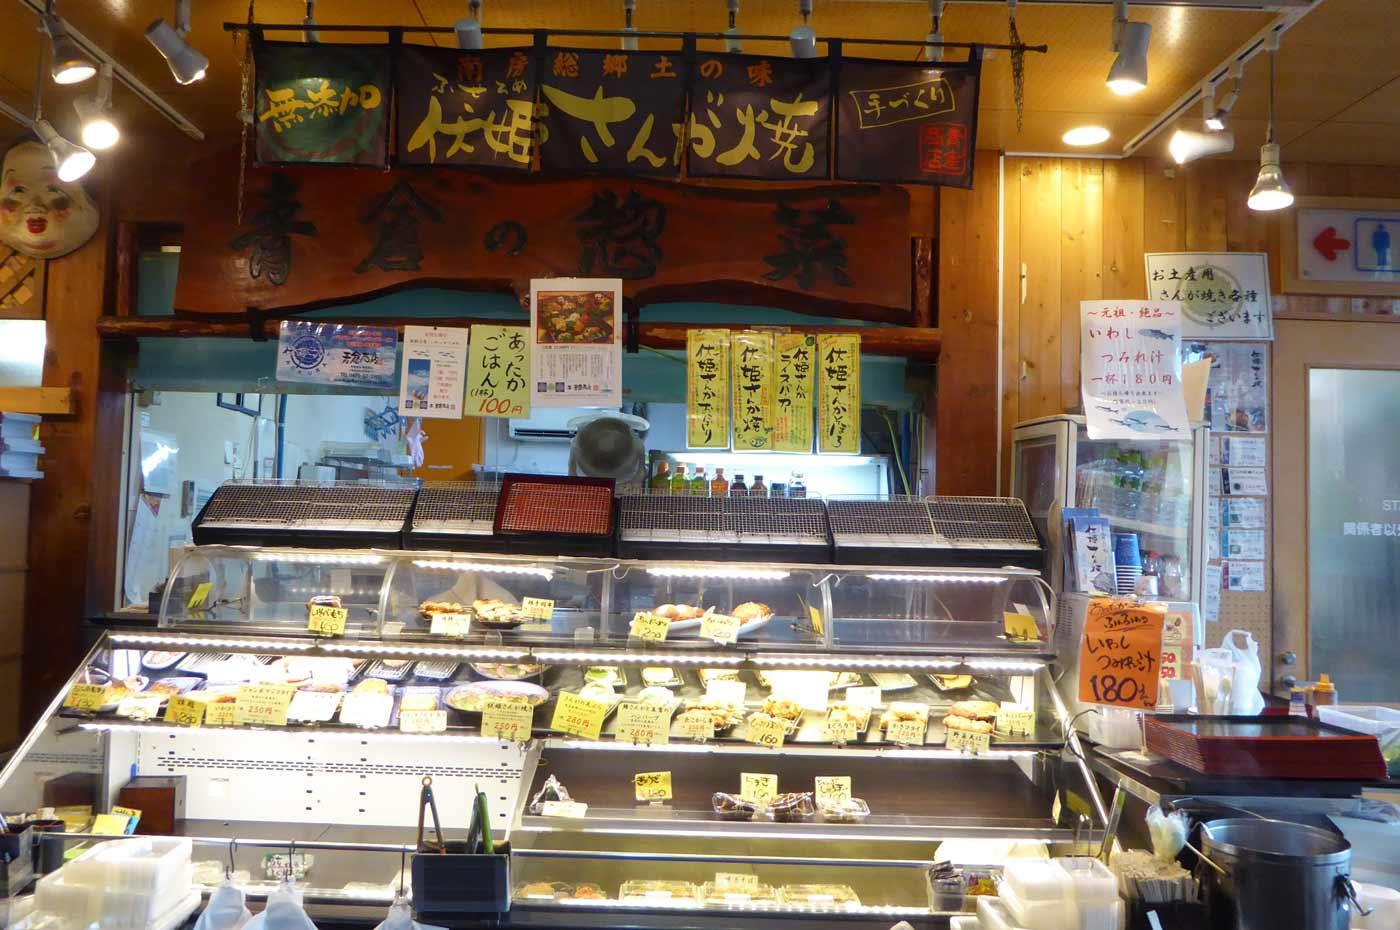 青倉商店の店舗画像